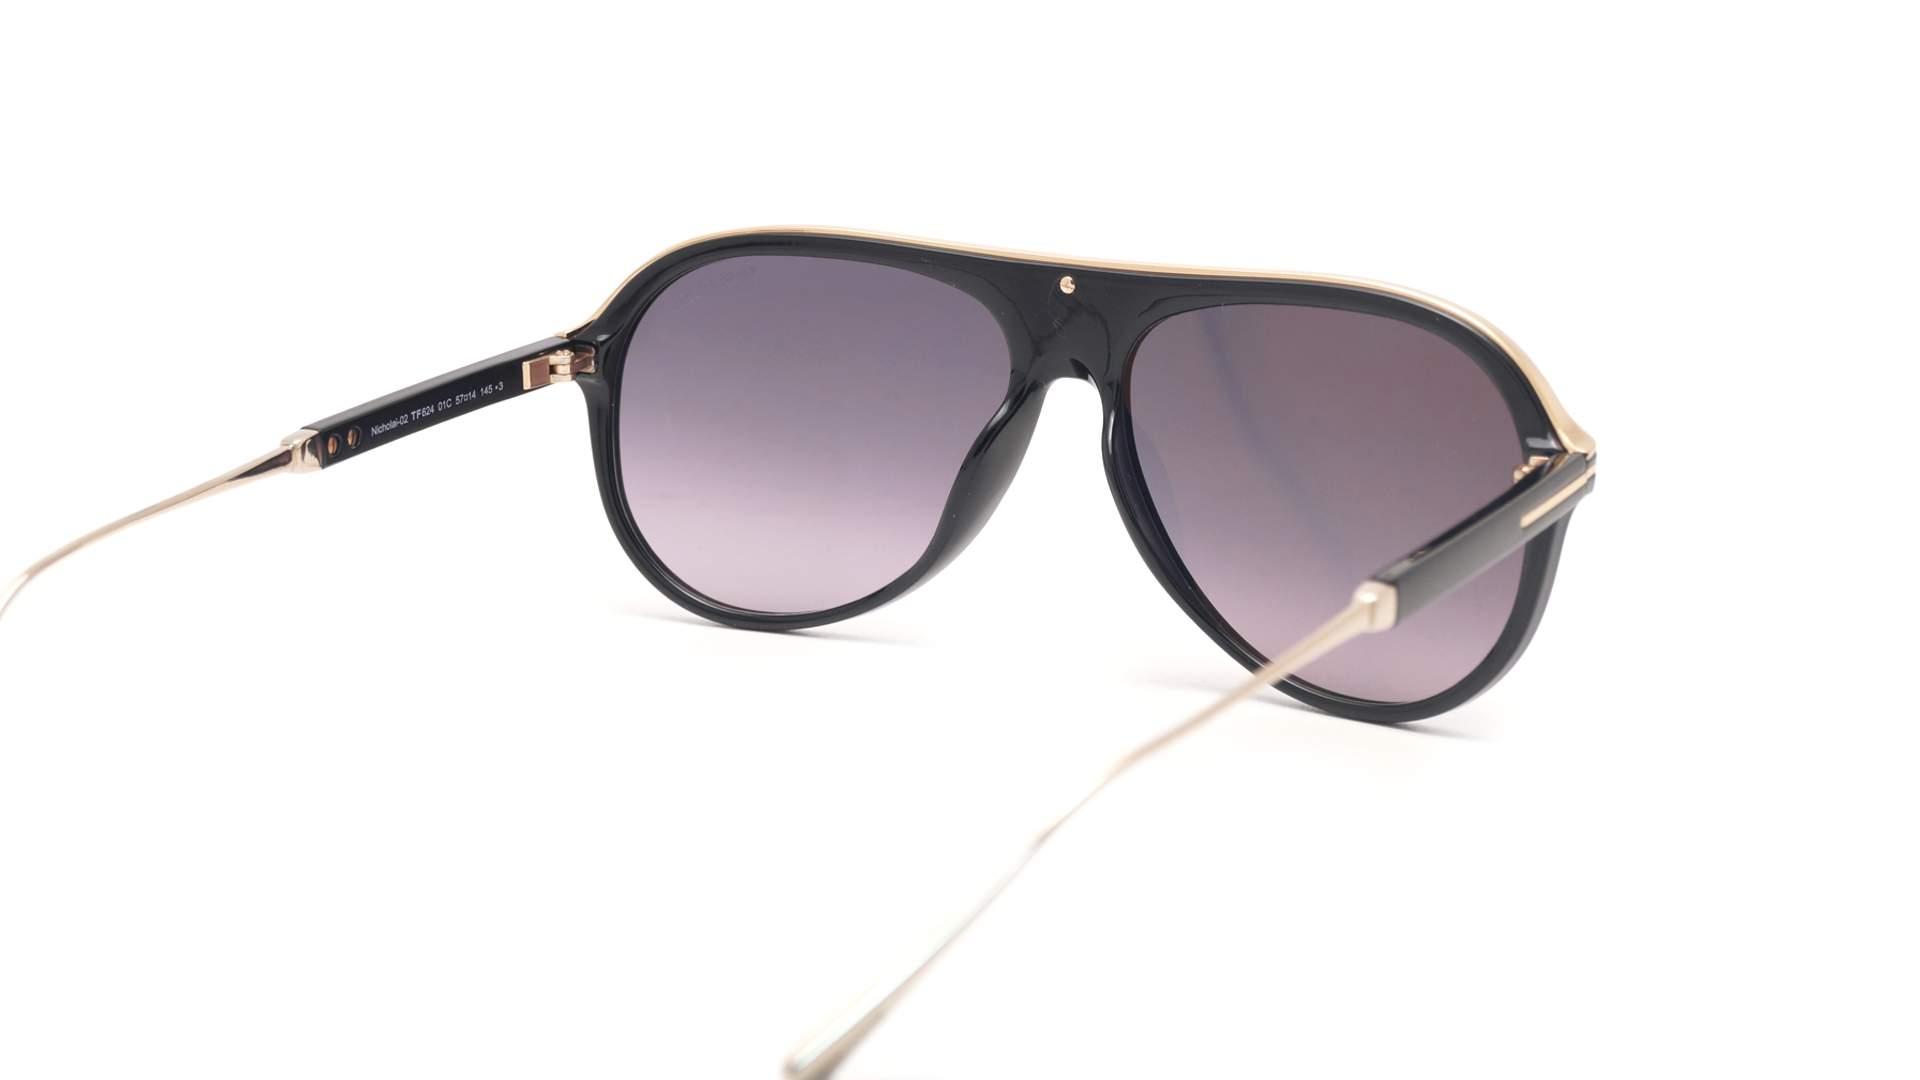 9b3f31560410 Sunglasses Tom Ford Nicholai-02 Black FT0624S 01C 57-14 Medium Gradient